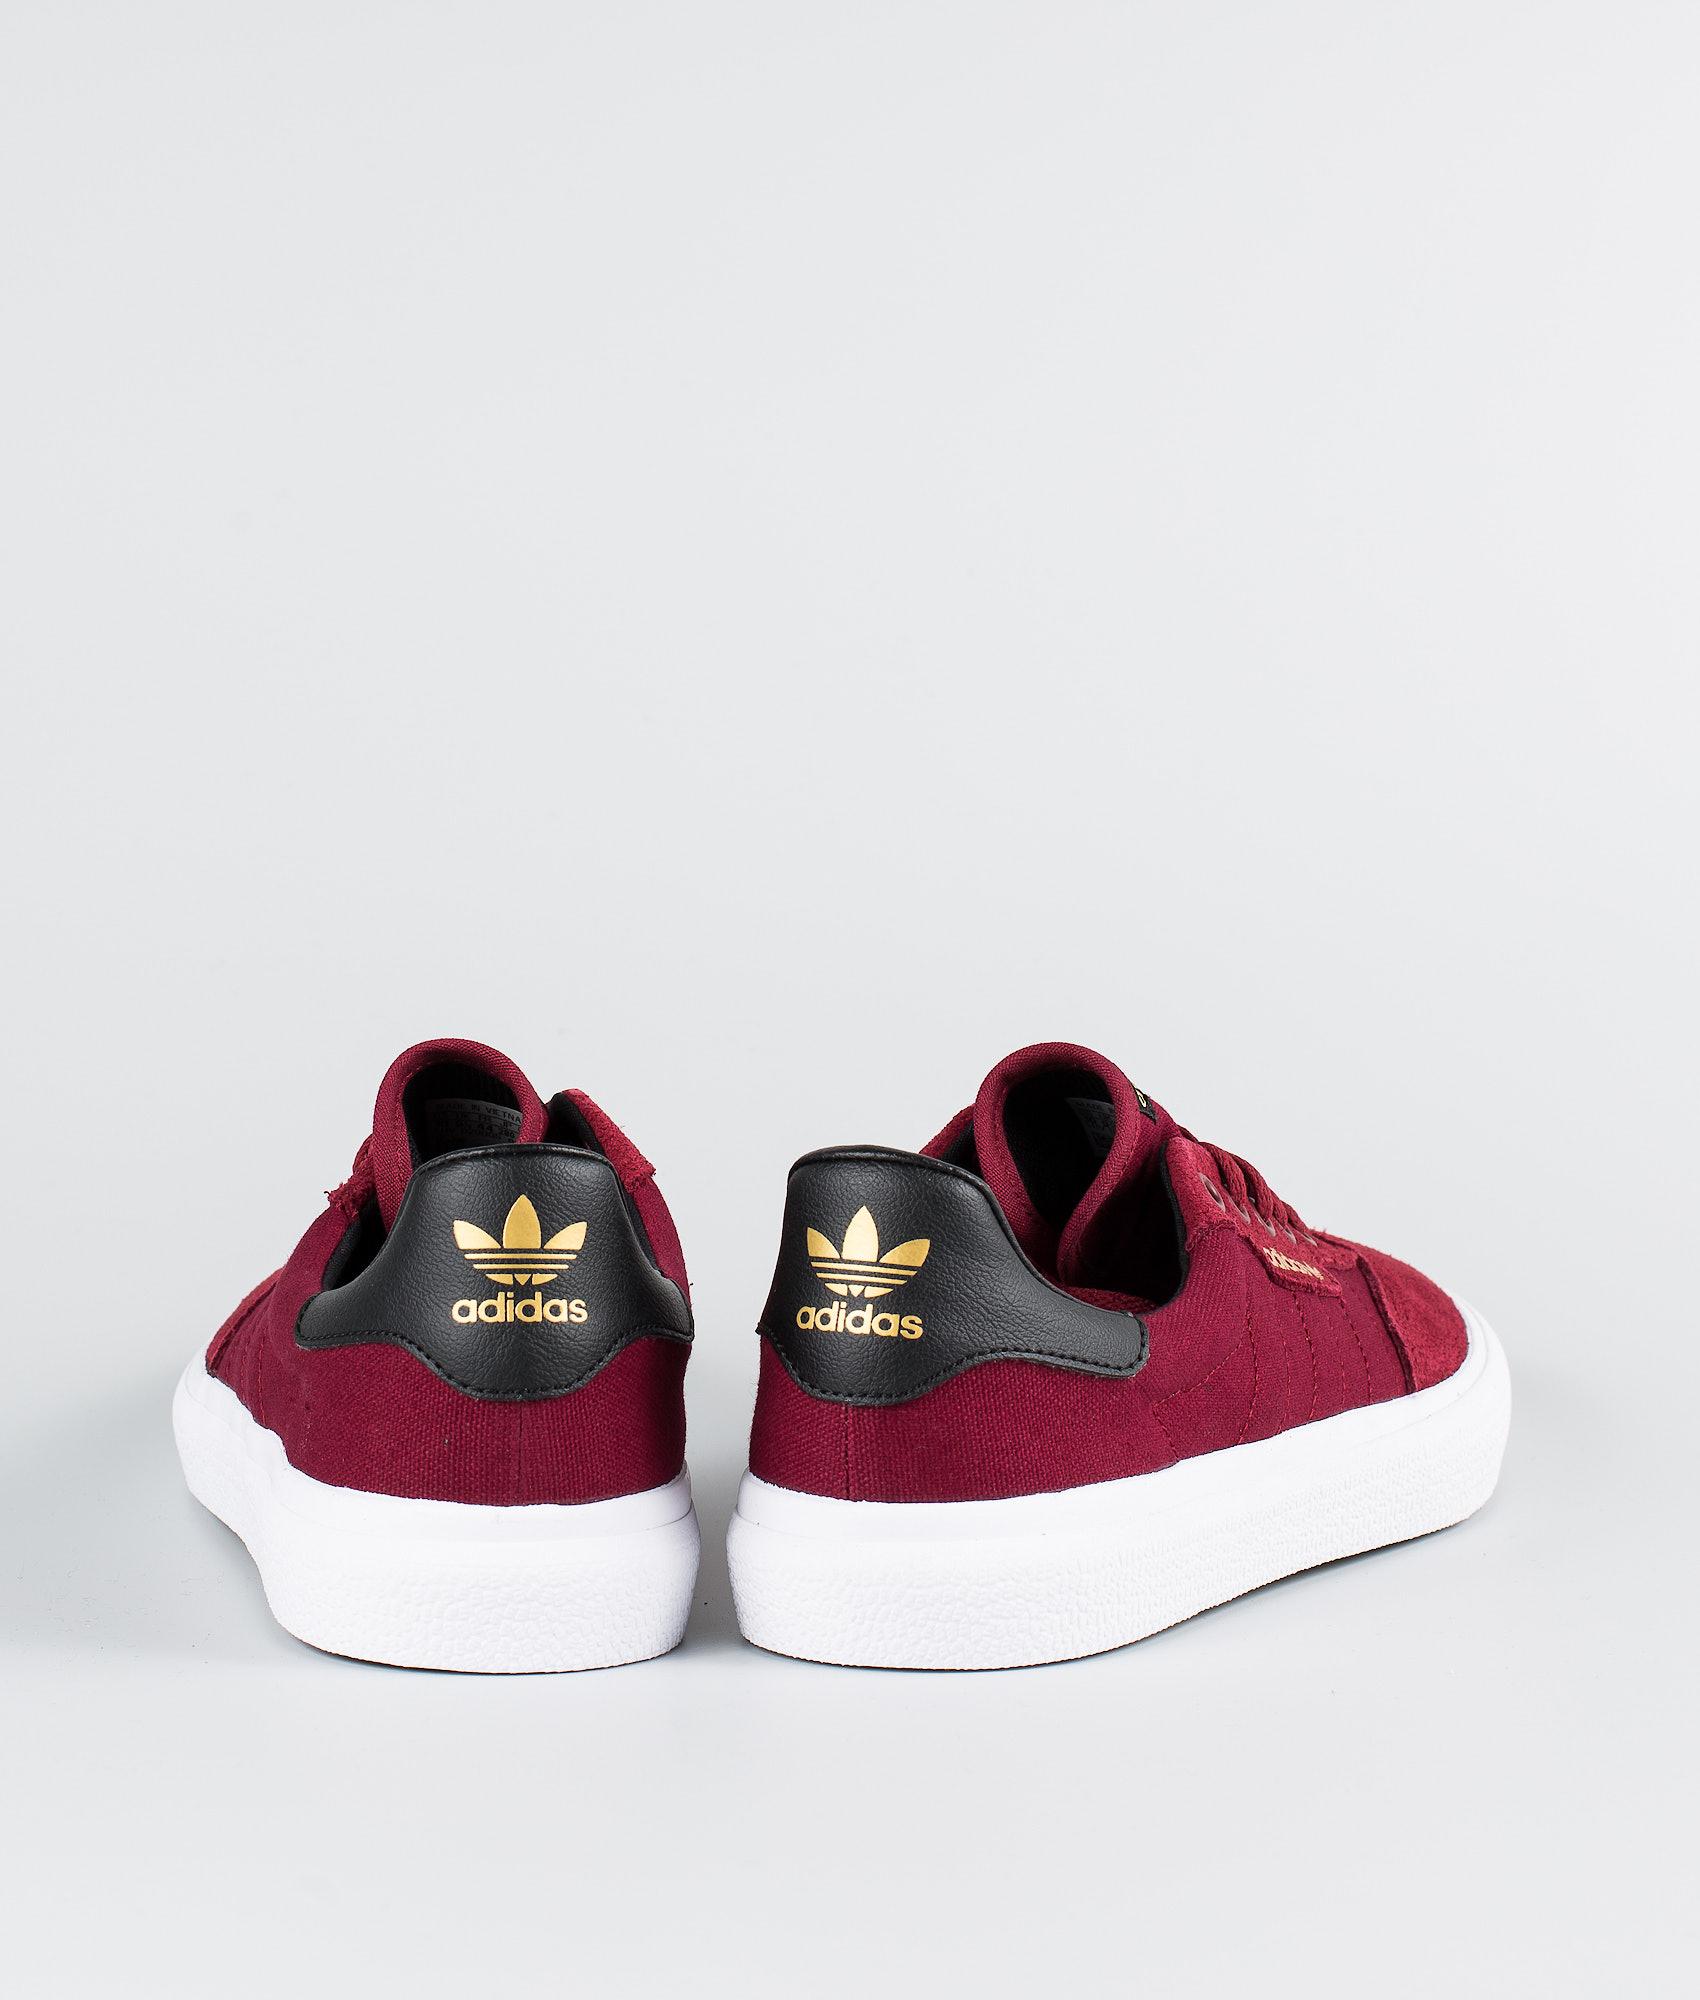 online store 36446 1c29e Adidas Skateboarding 3Mc Shoes